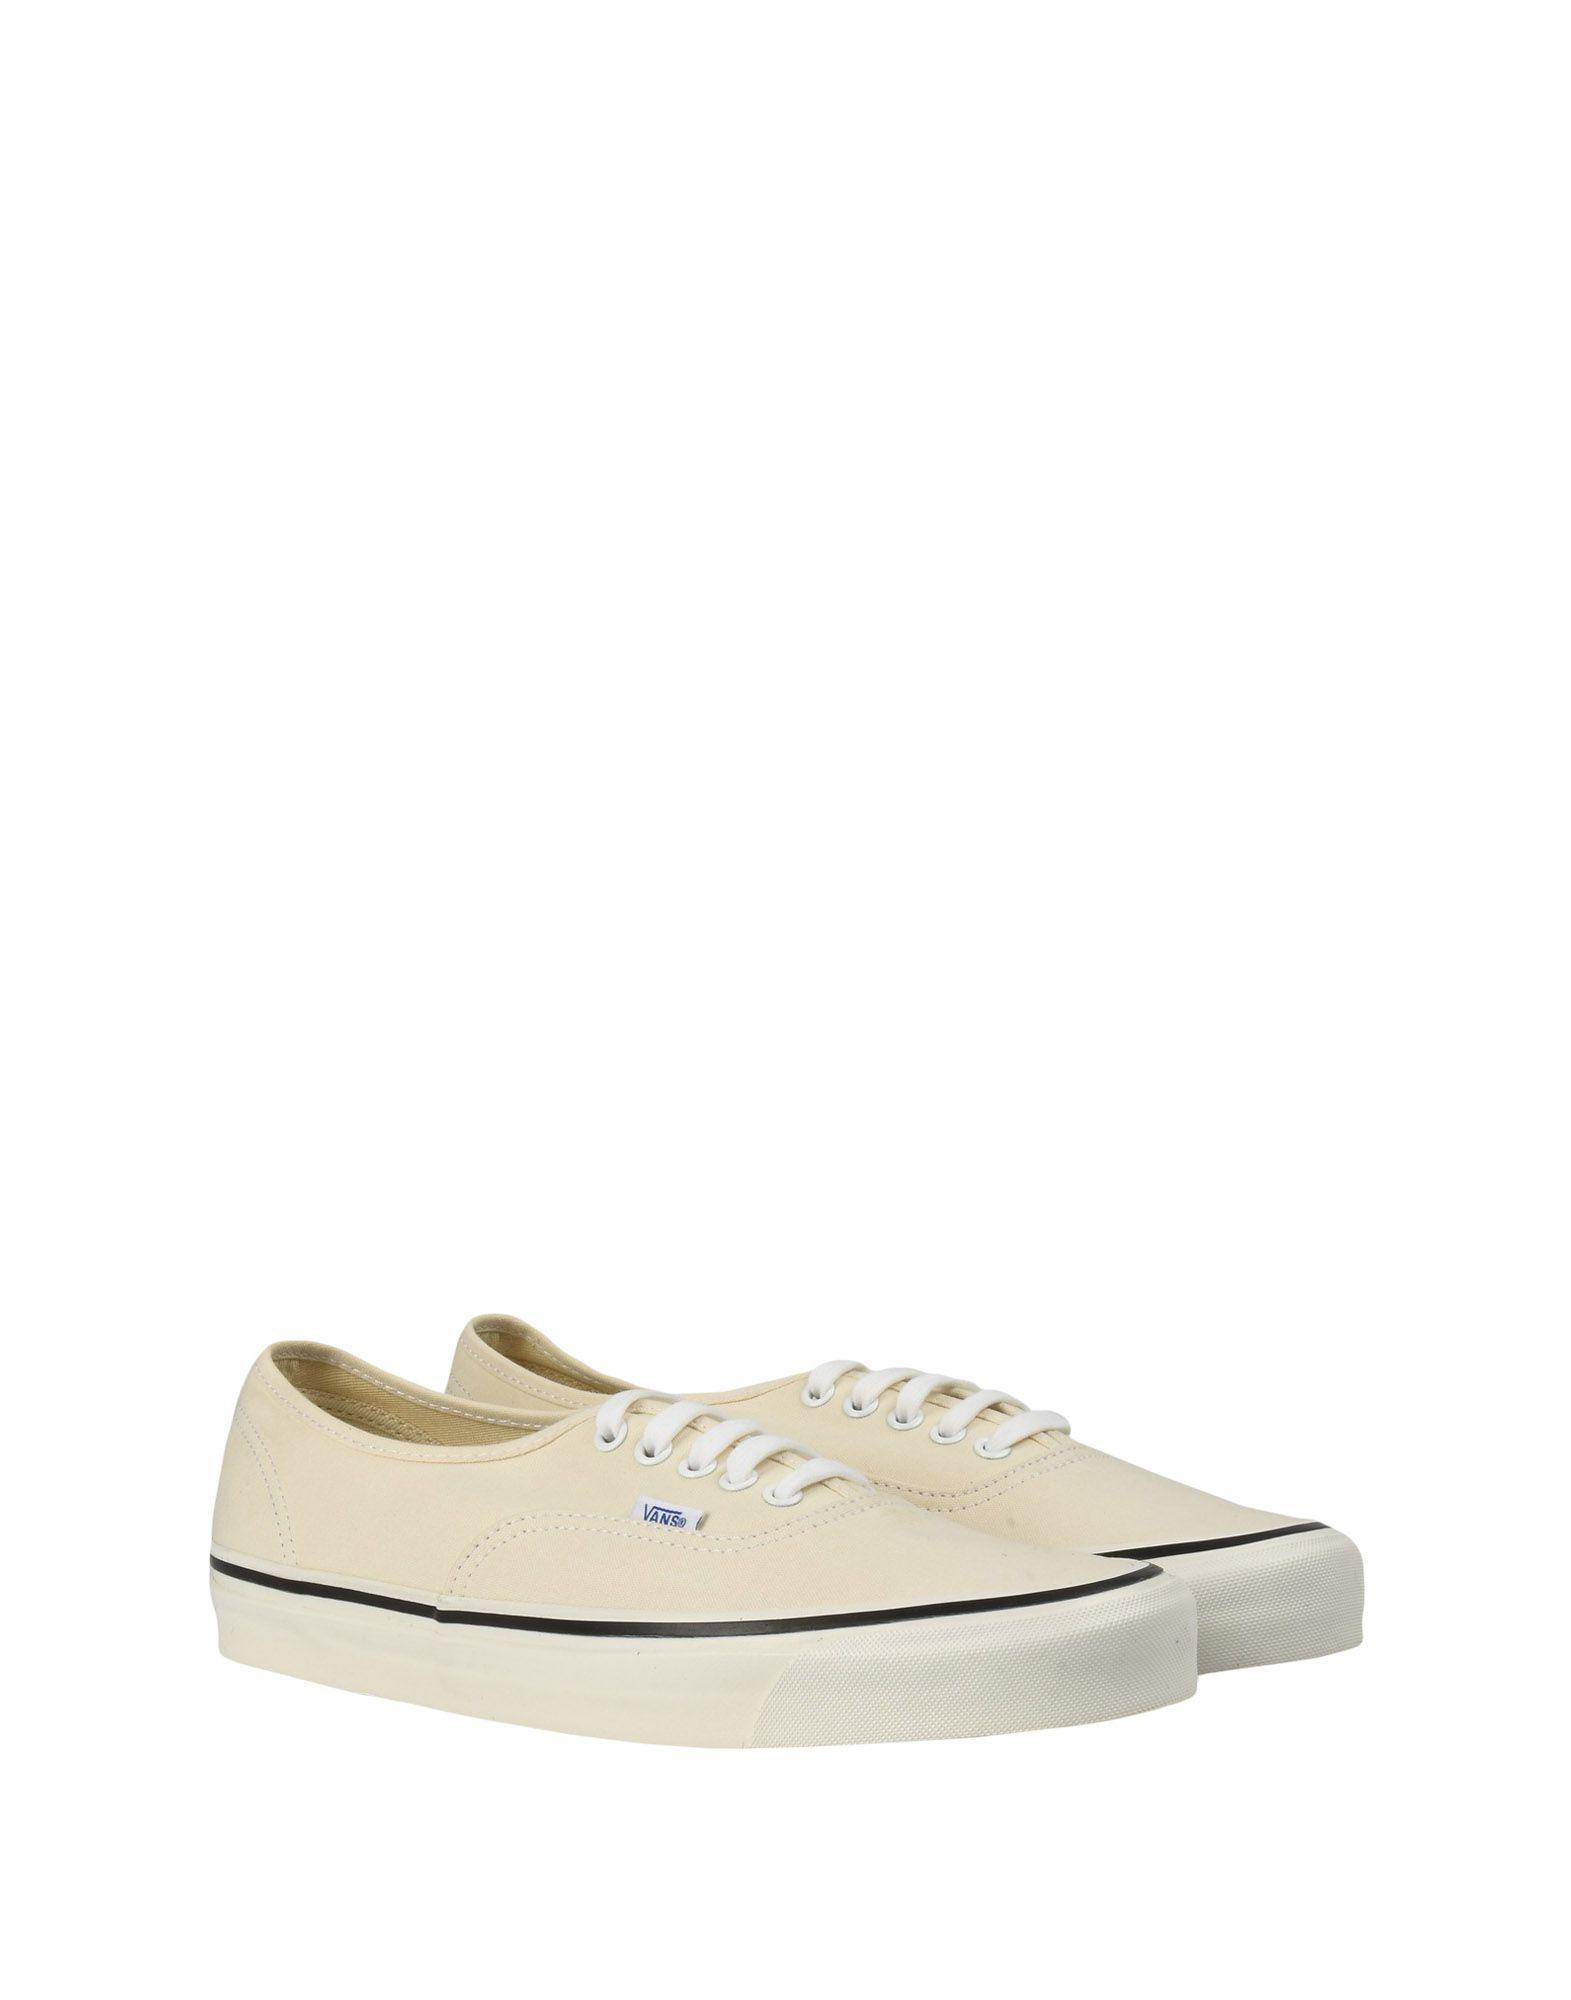 Moda Sneakers Sneakers Moda Vans Uomo - 11362884FQ b69120